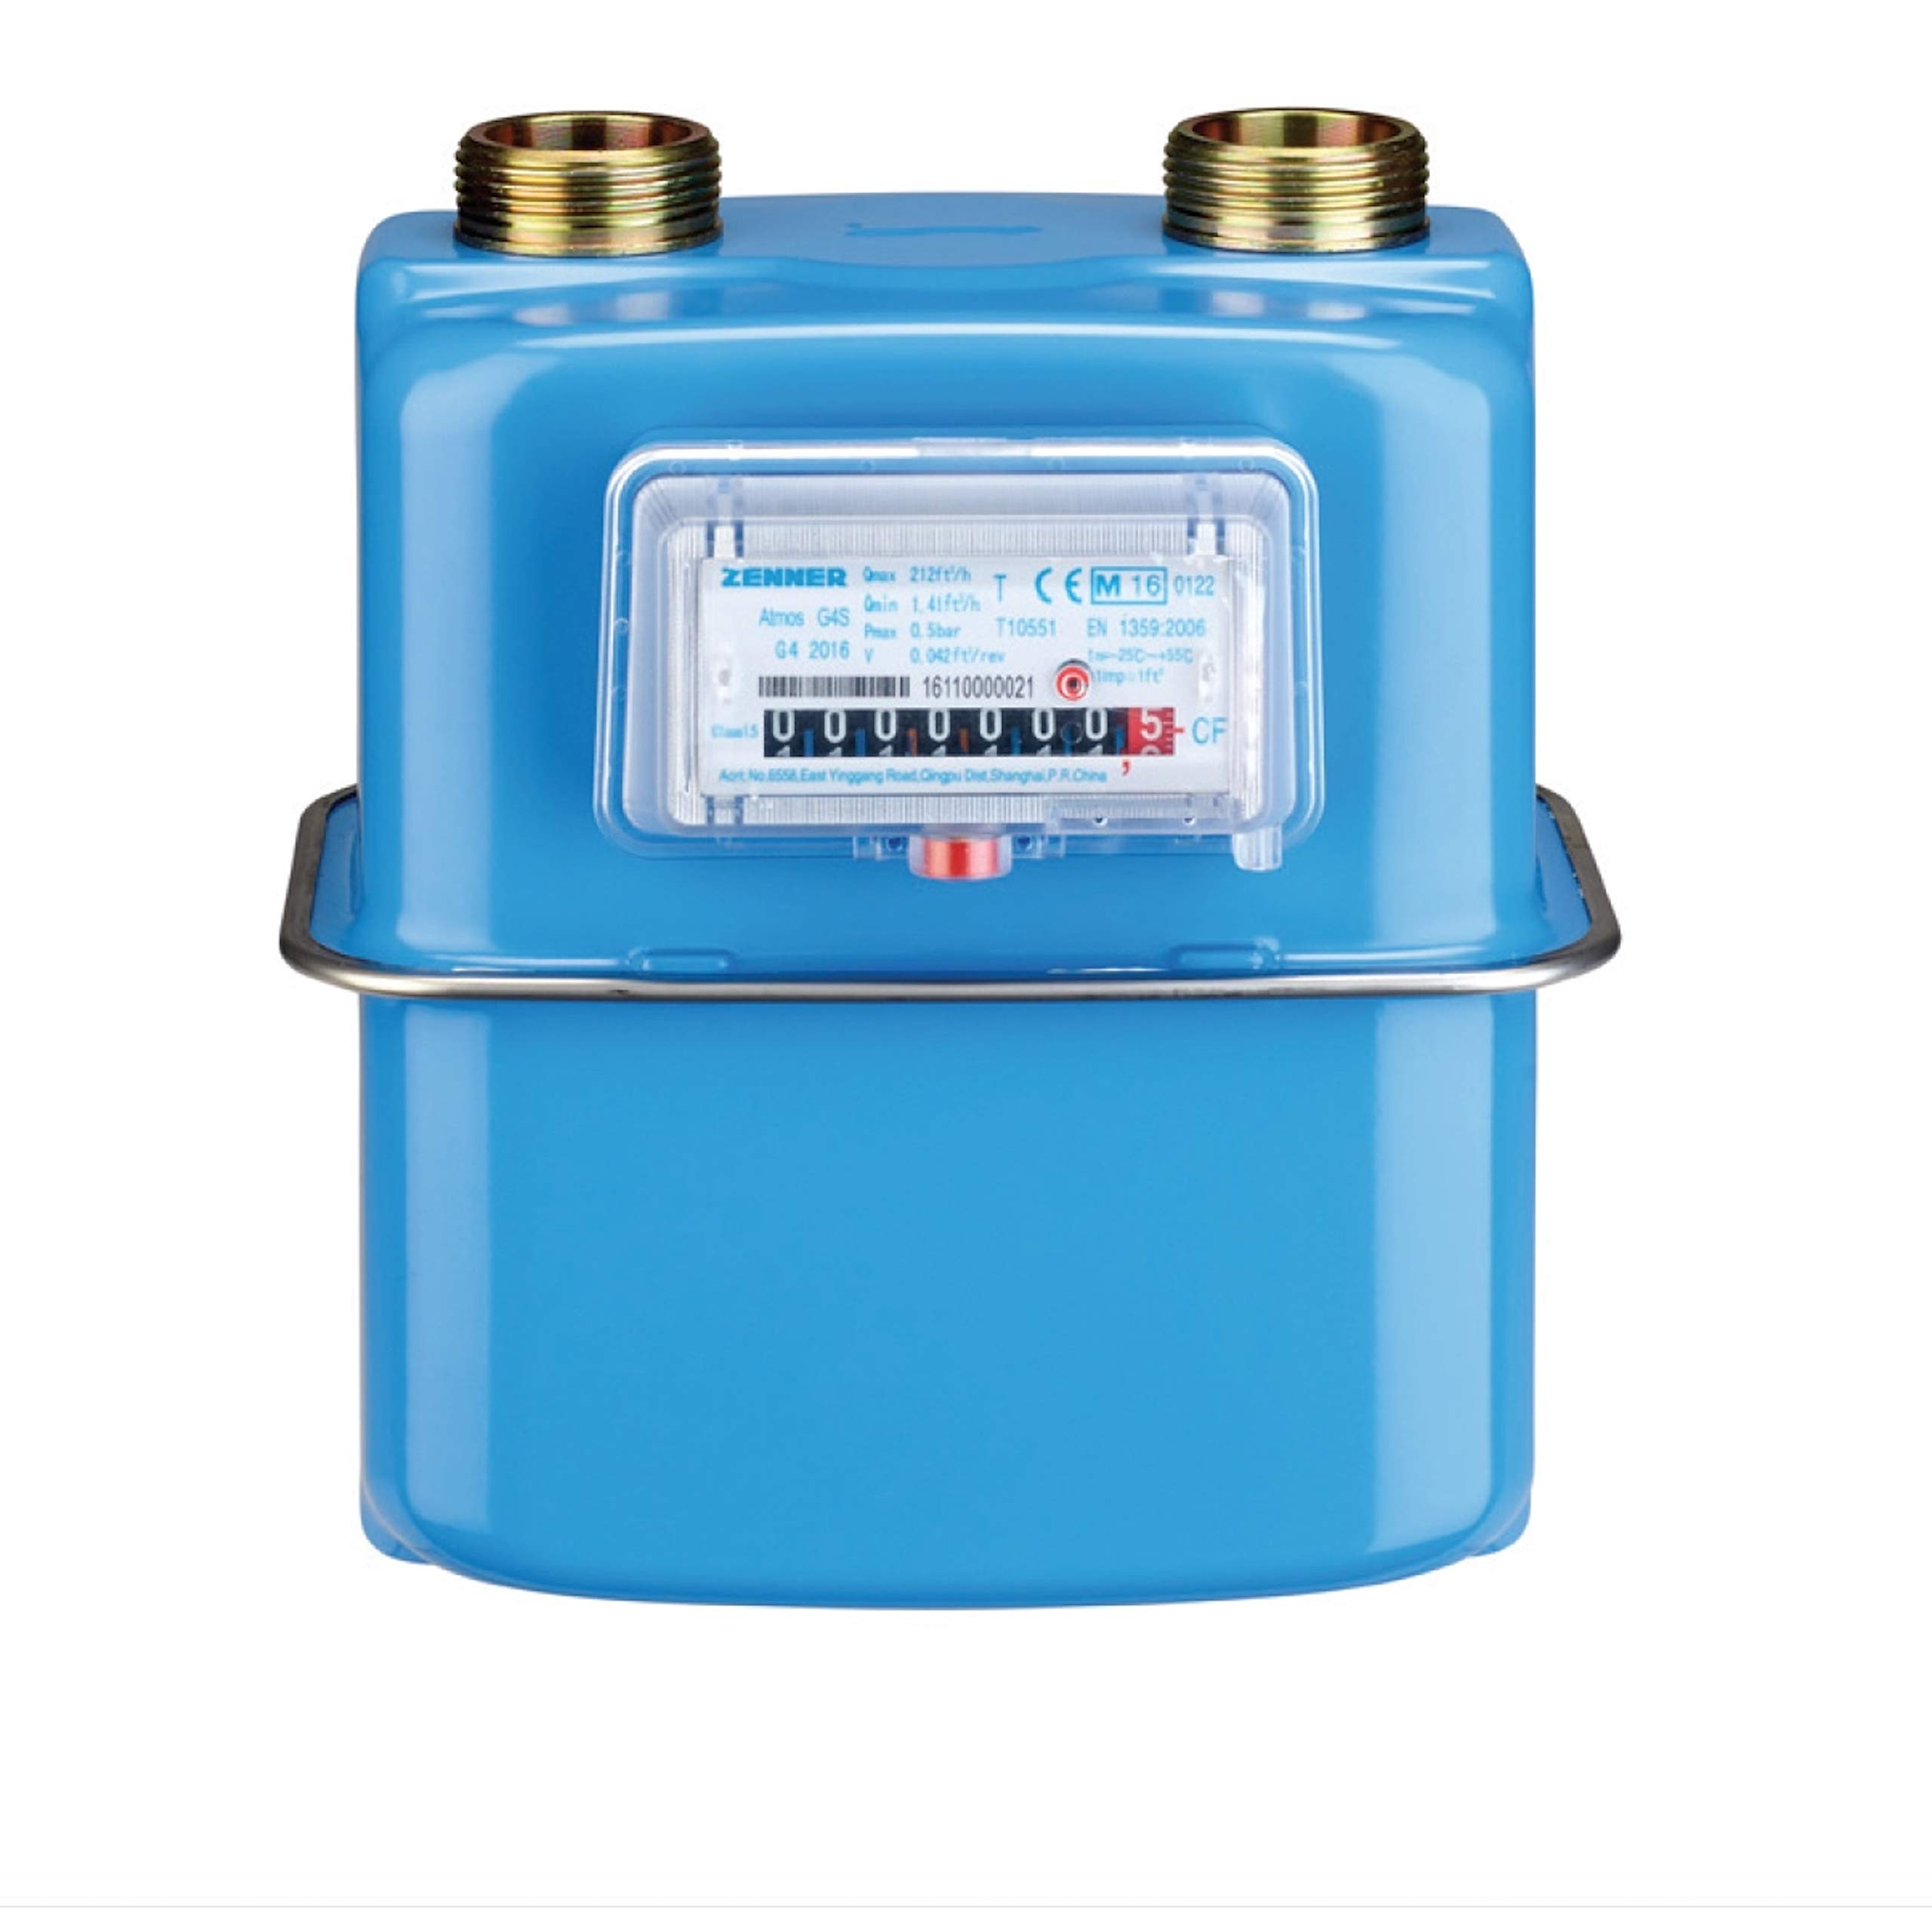 Gas Meter G4 Propane Natural Gas SUBMETER 436,000 BTU LPG Compact gasmeter 236,000 BTU NAT Gas by GASFLEX